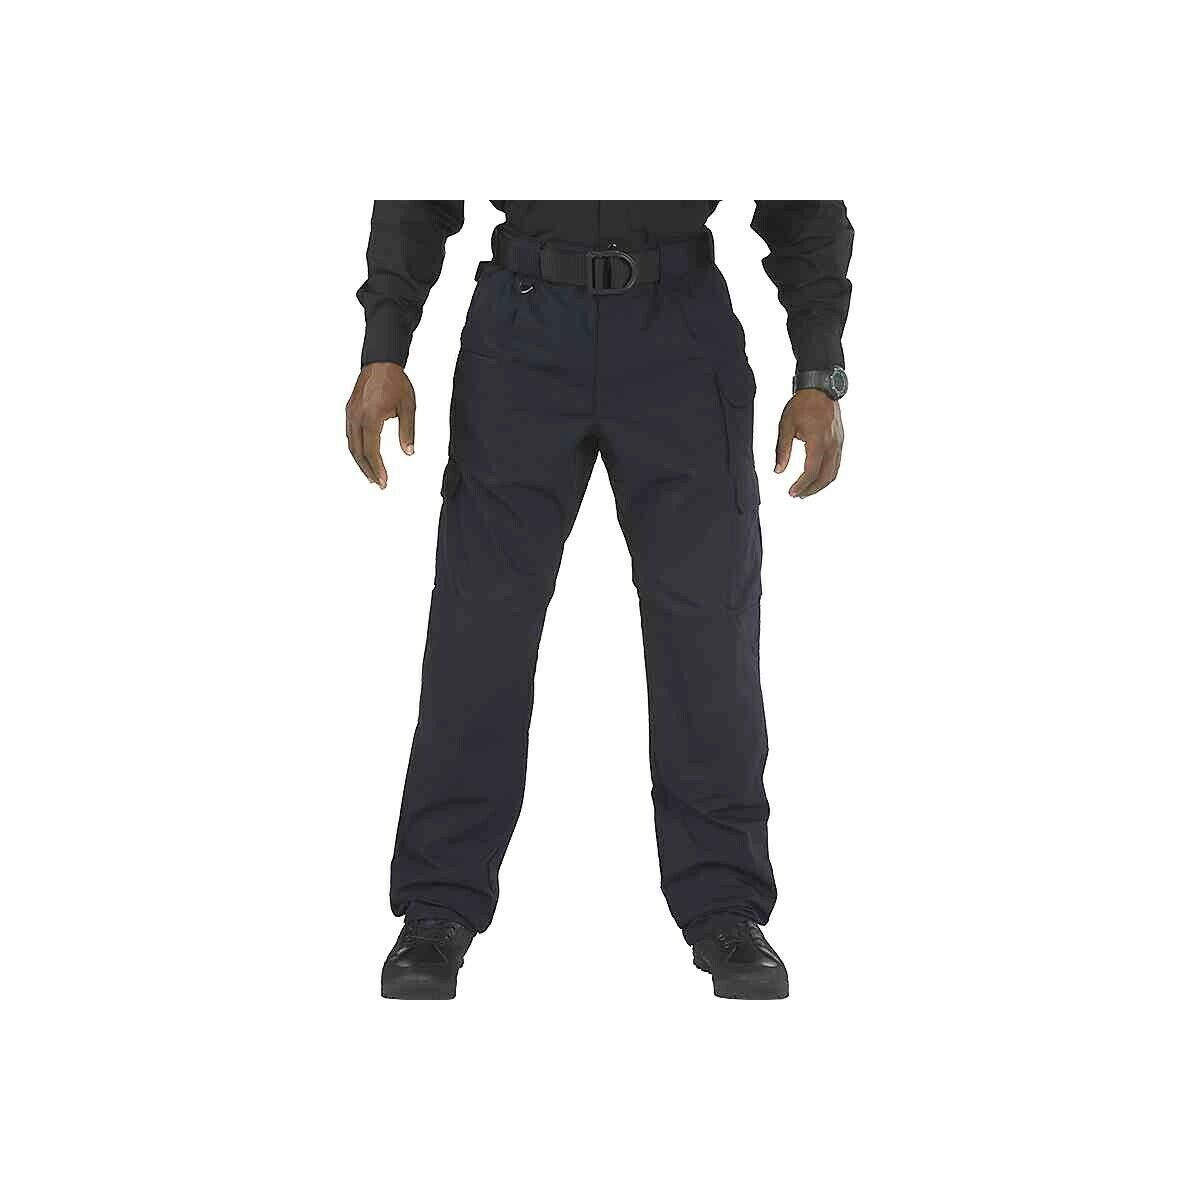 5.11 Men's Taclite Pro Pants Style 74273 Dark Navy